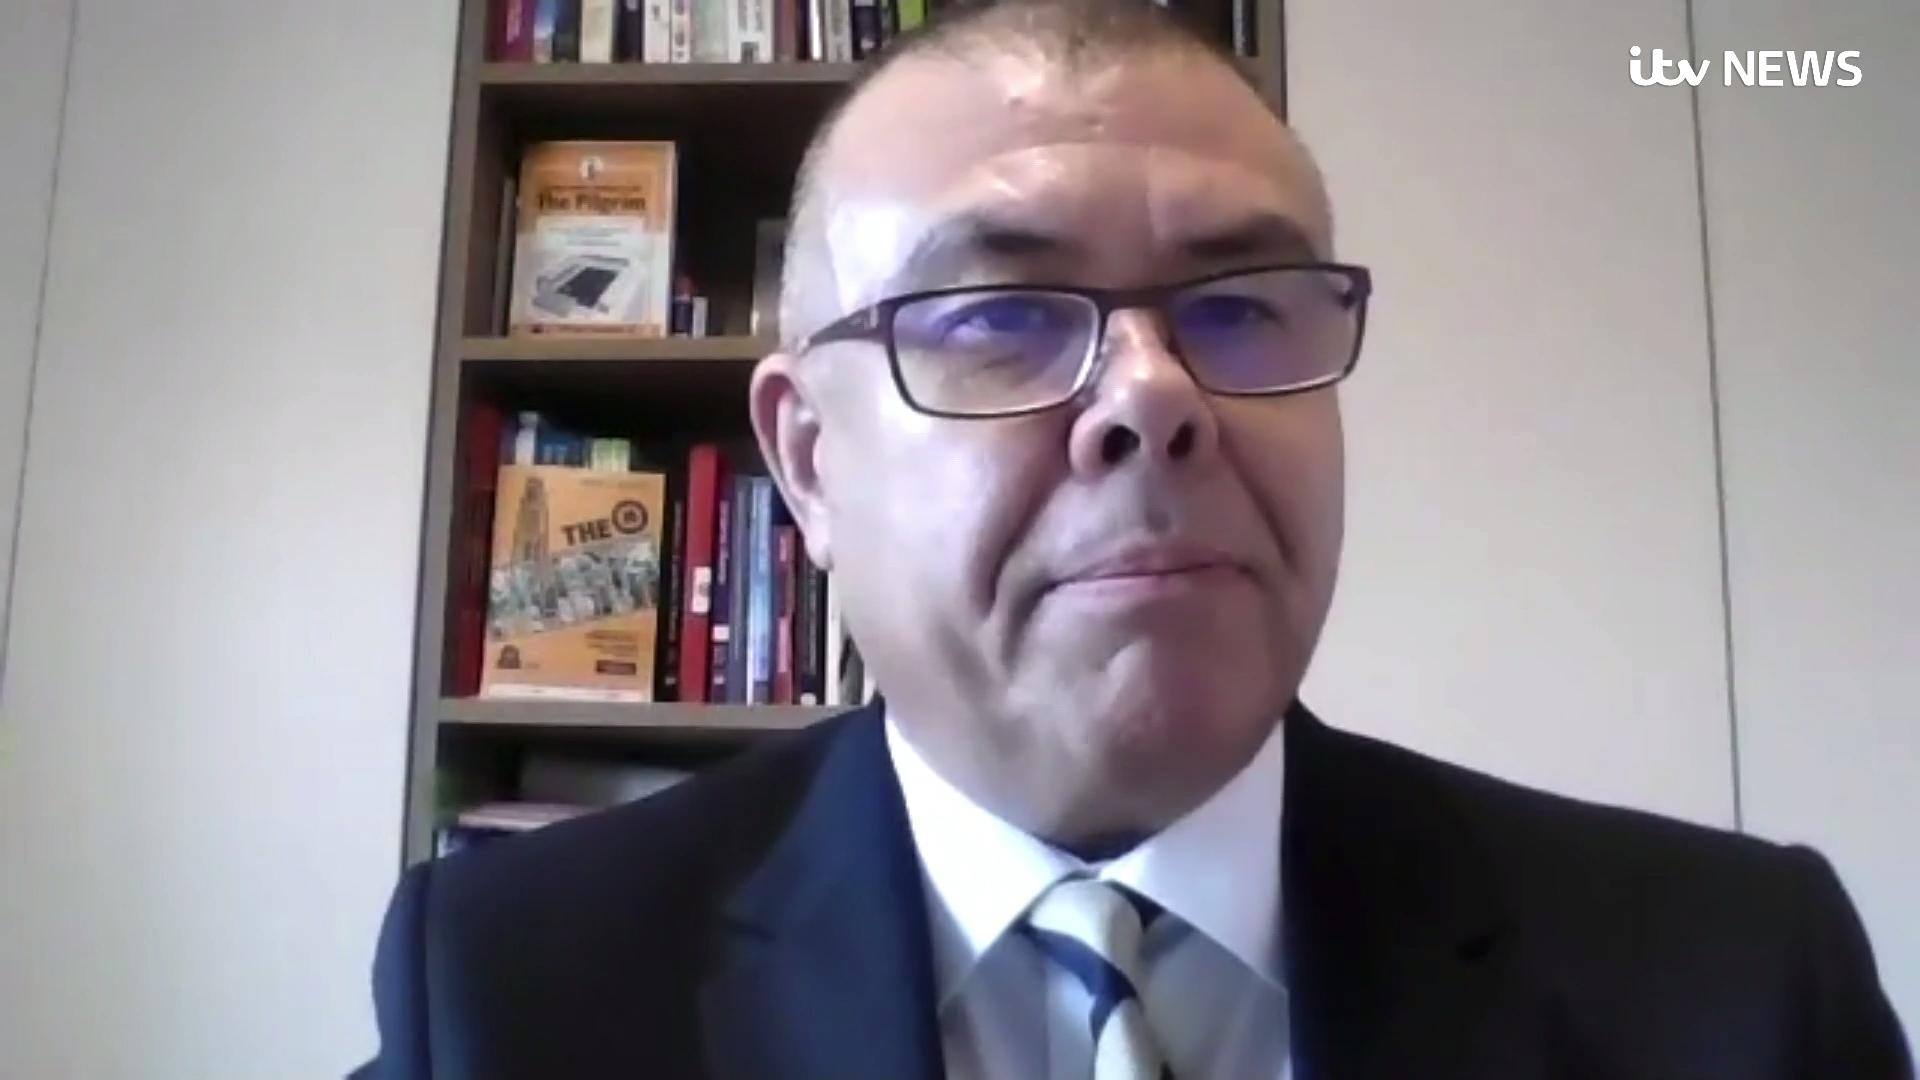 Covid vaccine is 'terrific news' but do not relax yet, Professor Van Tam warns | ITV News